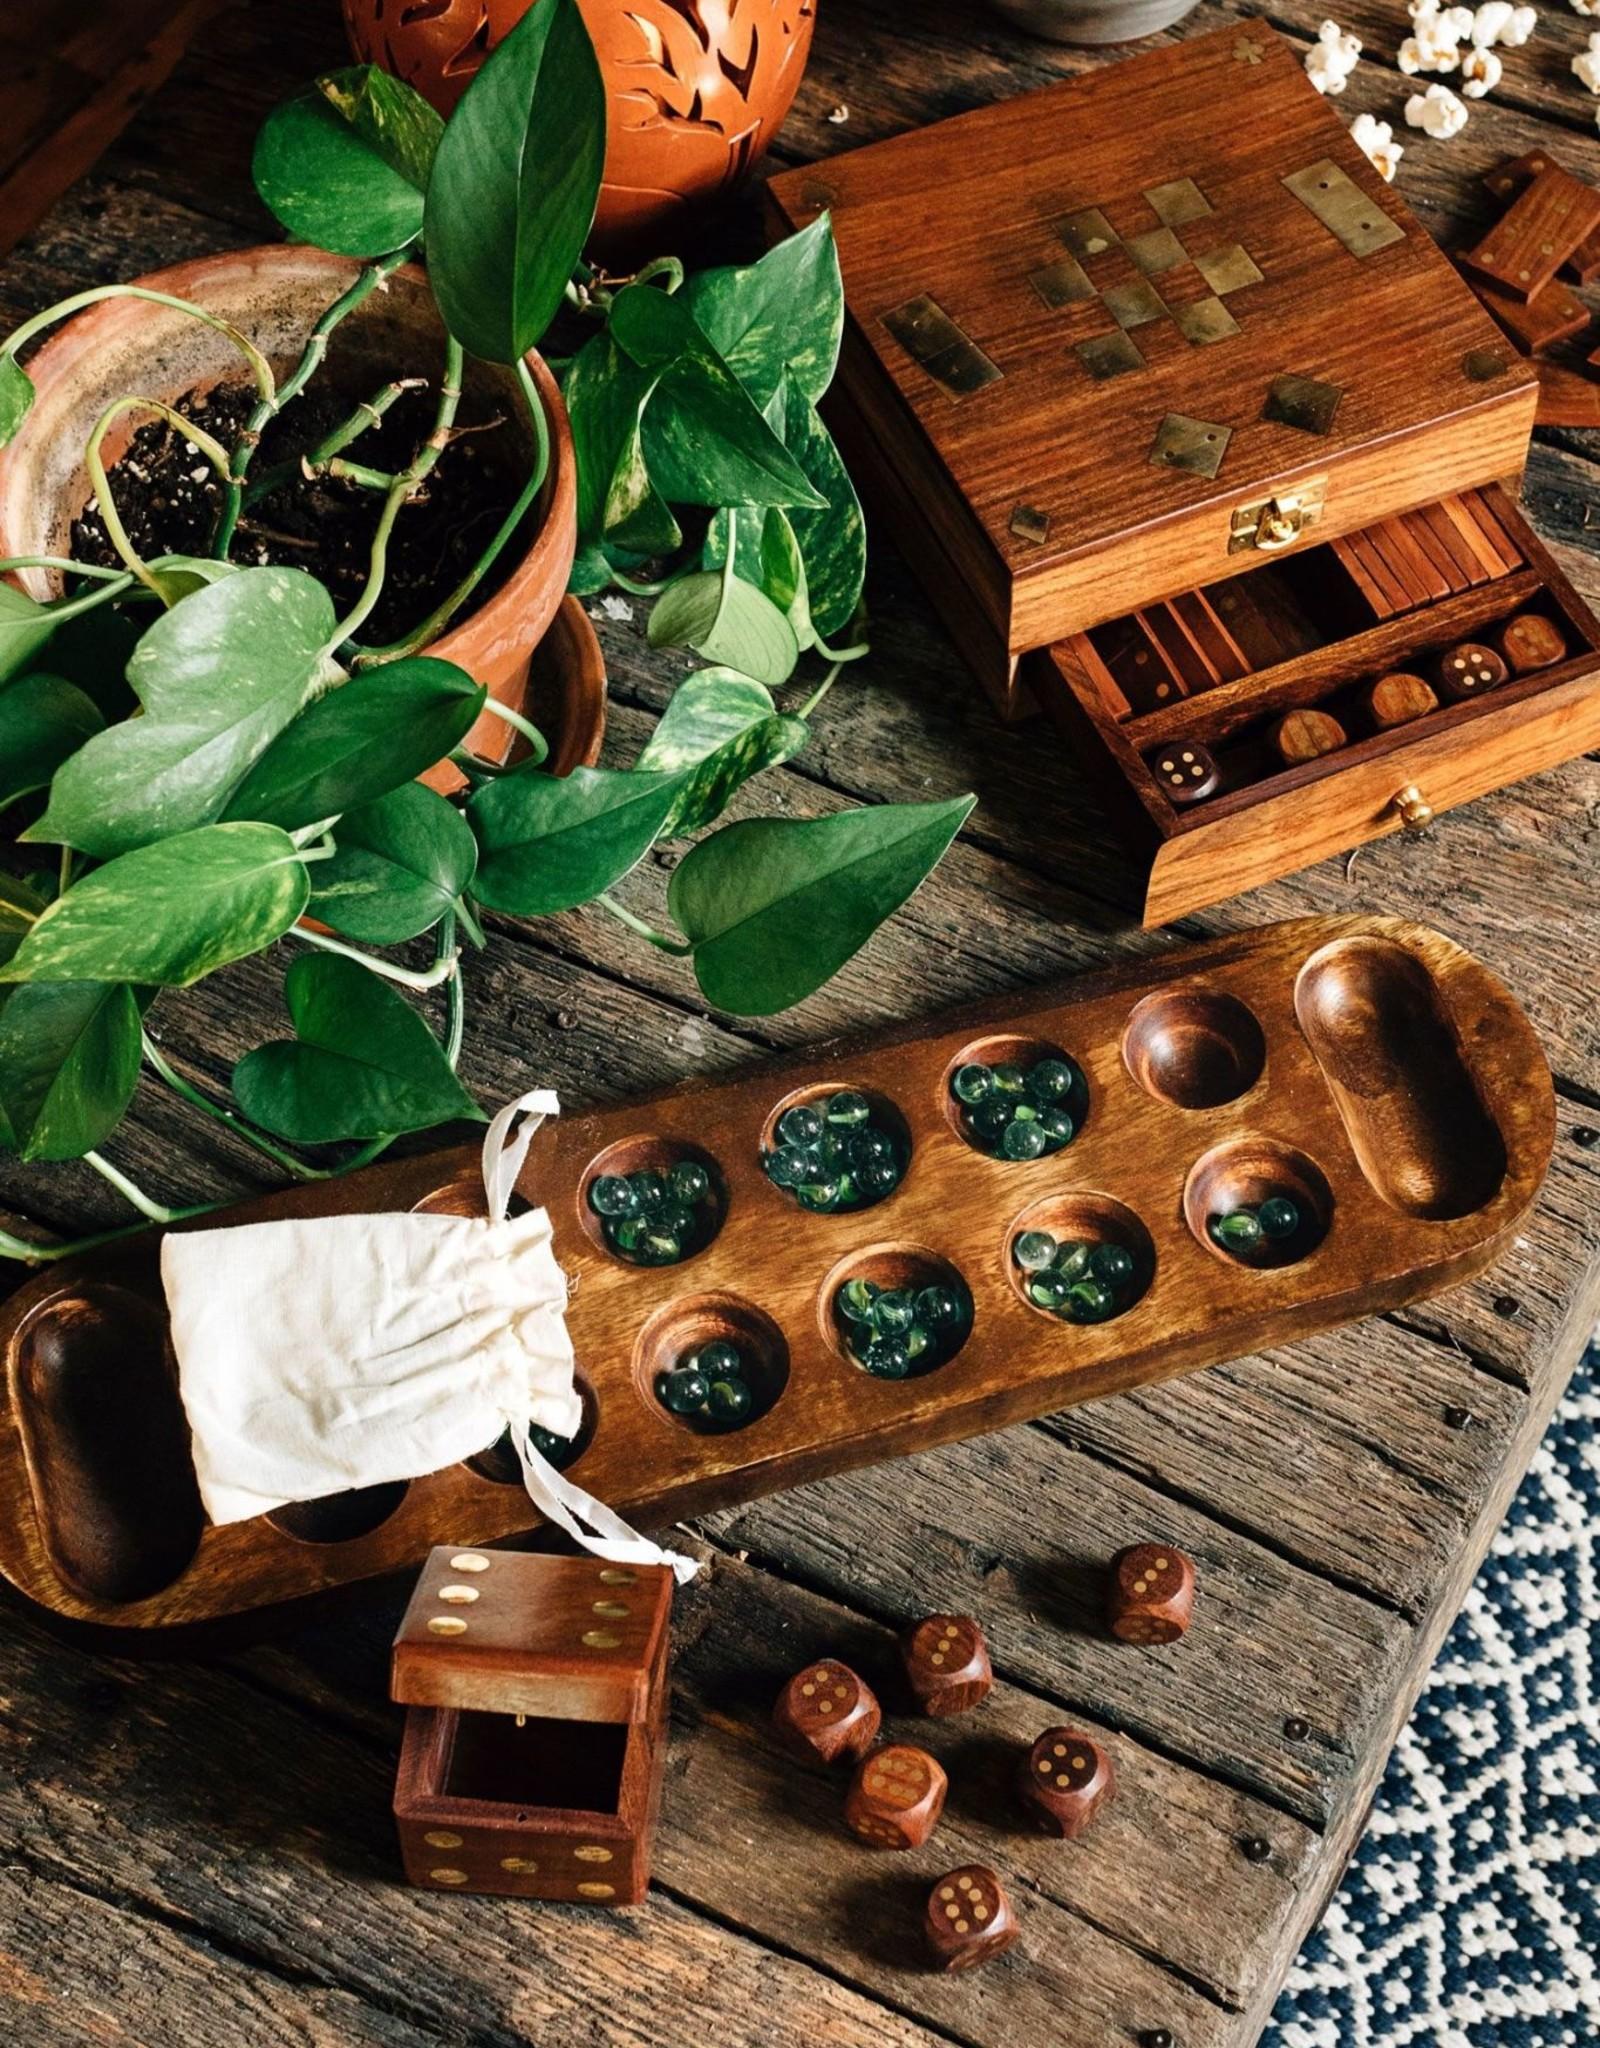 Ten Thousand Villages Mancala Game